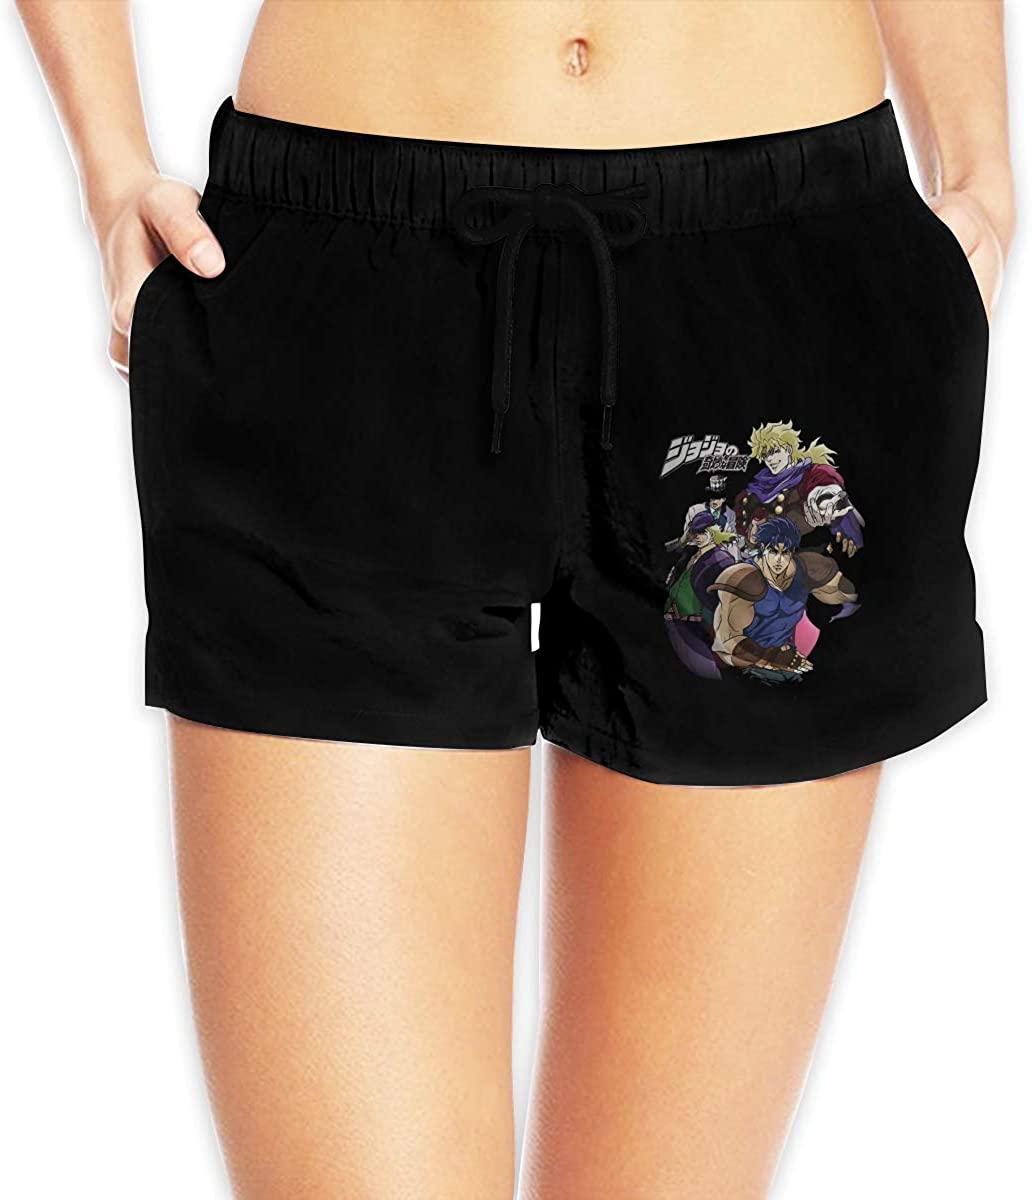 Women Sexy Hot Pants Summer Casual Shorts JoJos Bizarre Adventure Short Beach Trousers